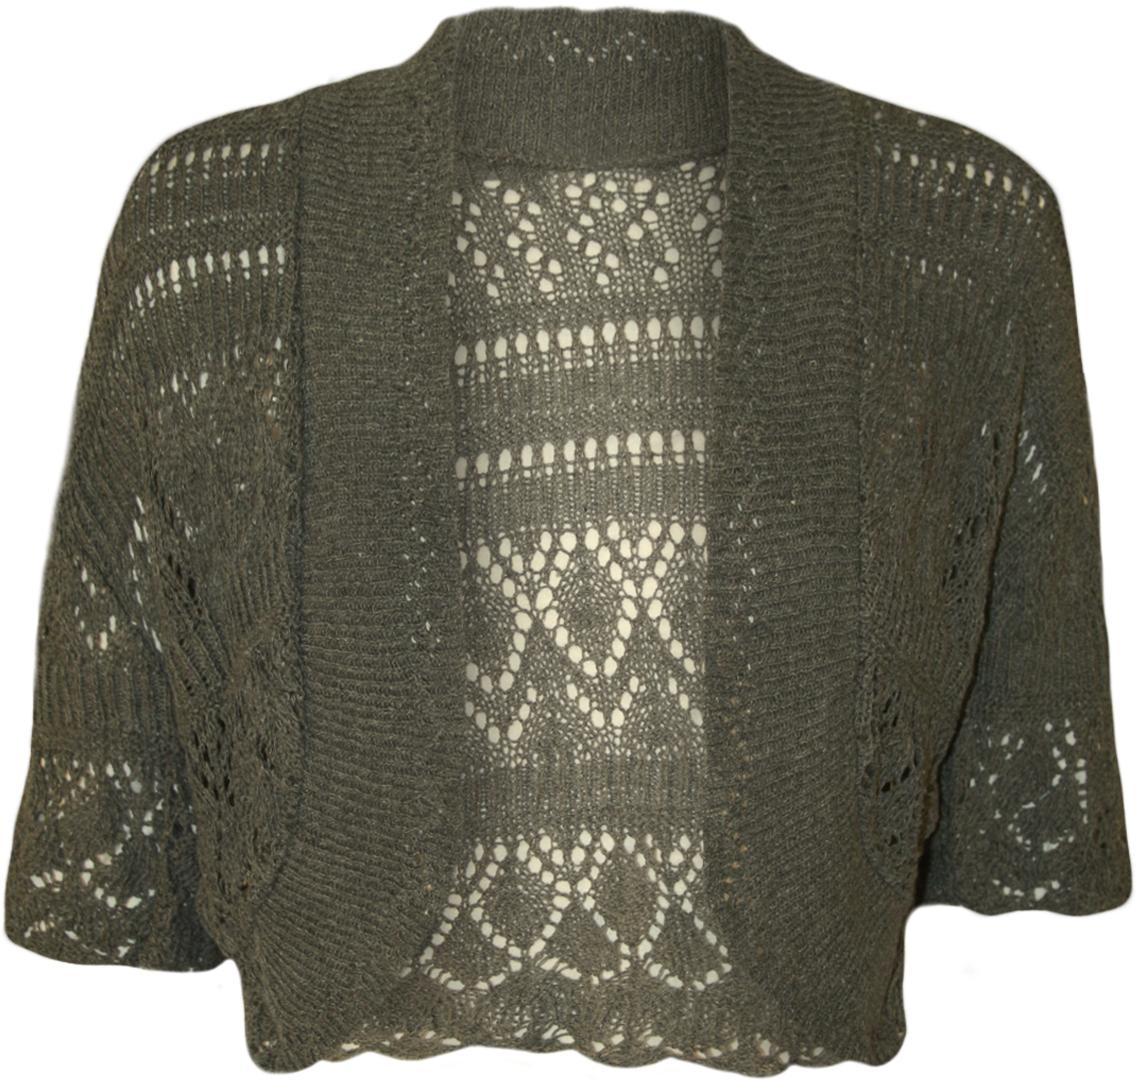 Knitting Pattern Ladies Short Sleeve Cardigan : New Womens Crochet Knitted Short Sleeve Ladies Bolero Cardigan Top Shrug 14 -...